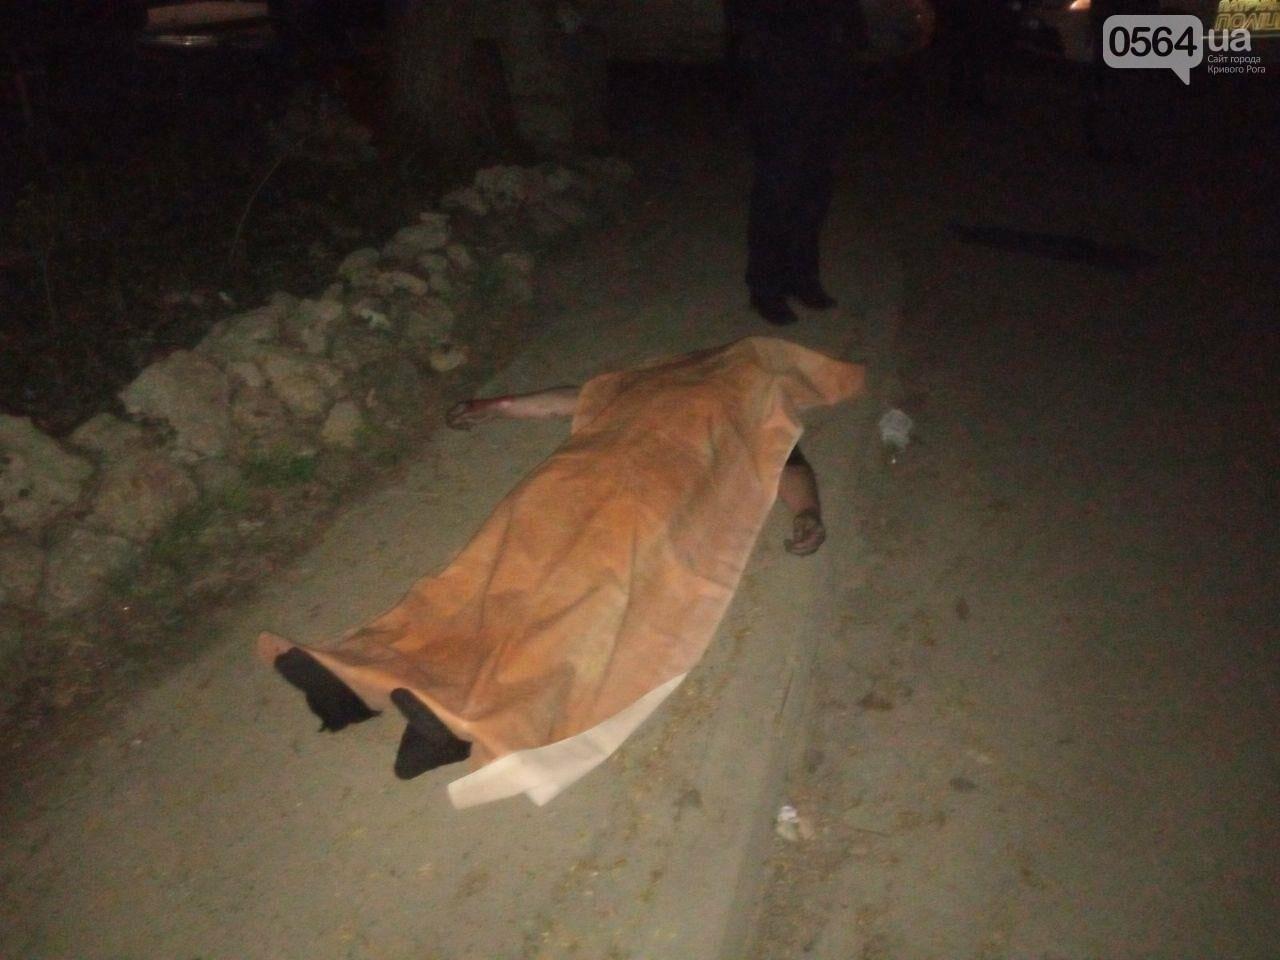 В Кривом Роге загорелась квартира на 6 этаже. Найдено тело мужчины, - ФОТО 18+, ВИДЕО, ОБНОВЛЕНО, фото-3